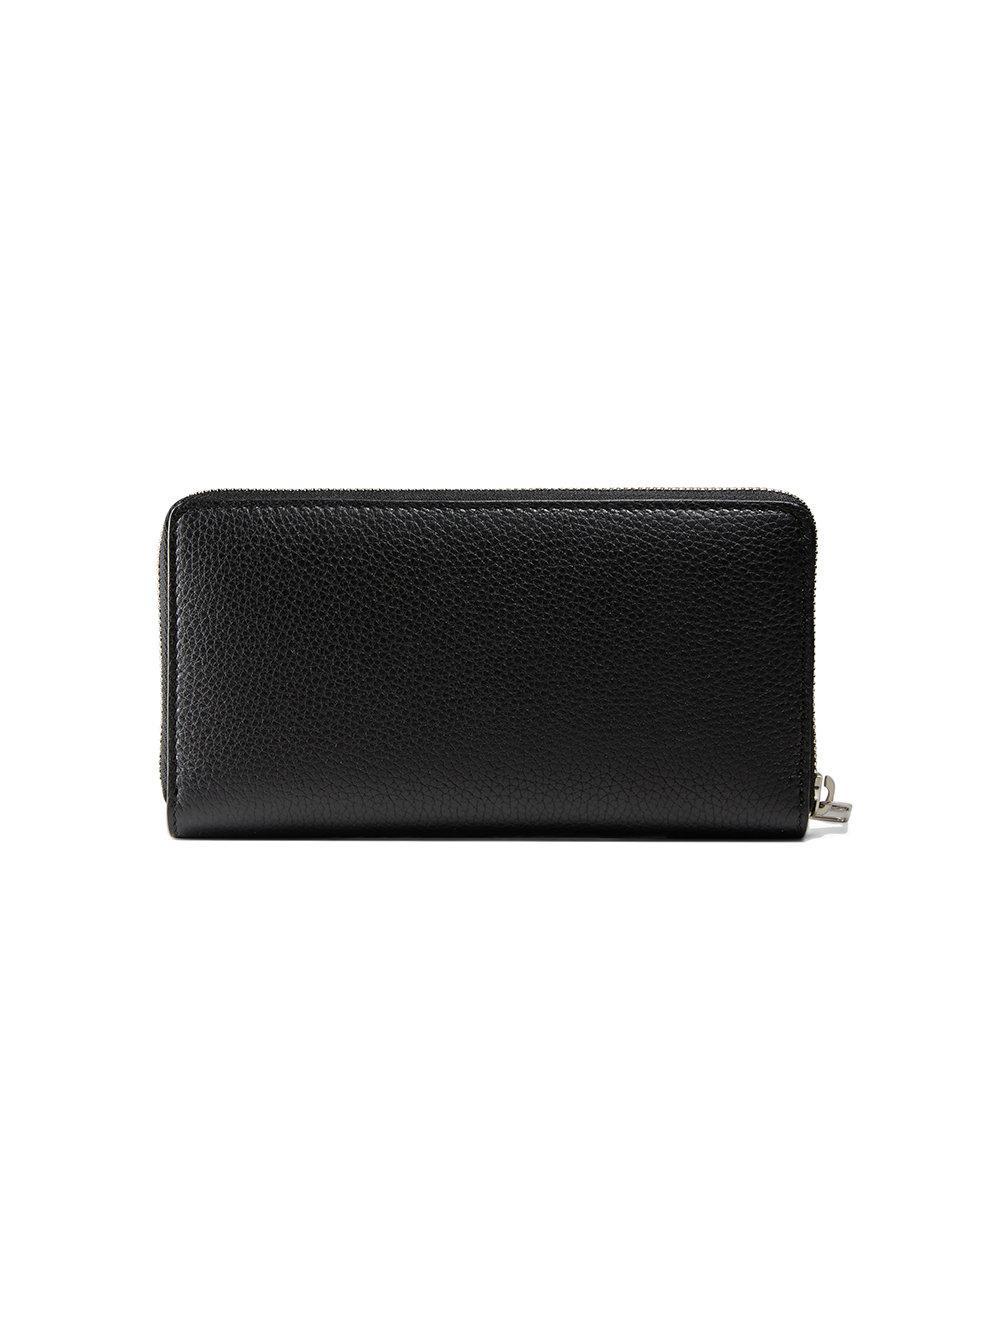 8ef2b8edb460 Lyst - Gucci Leather Zip Around Wallet in Black